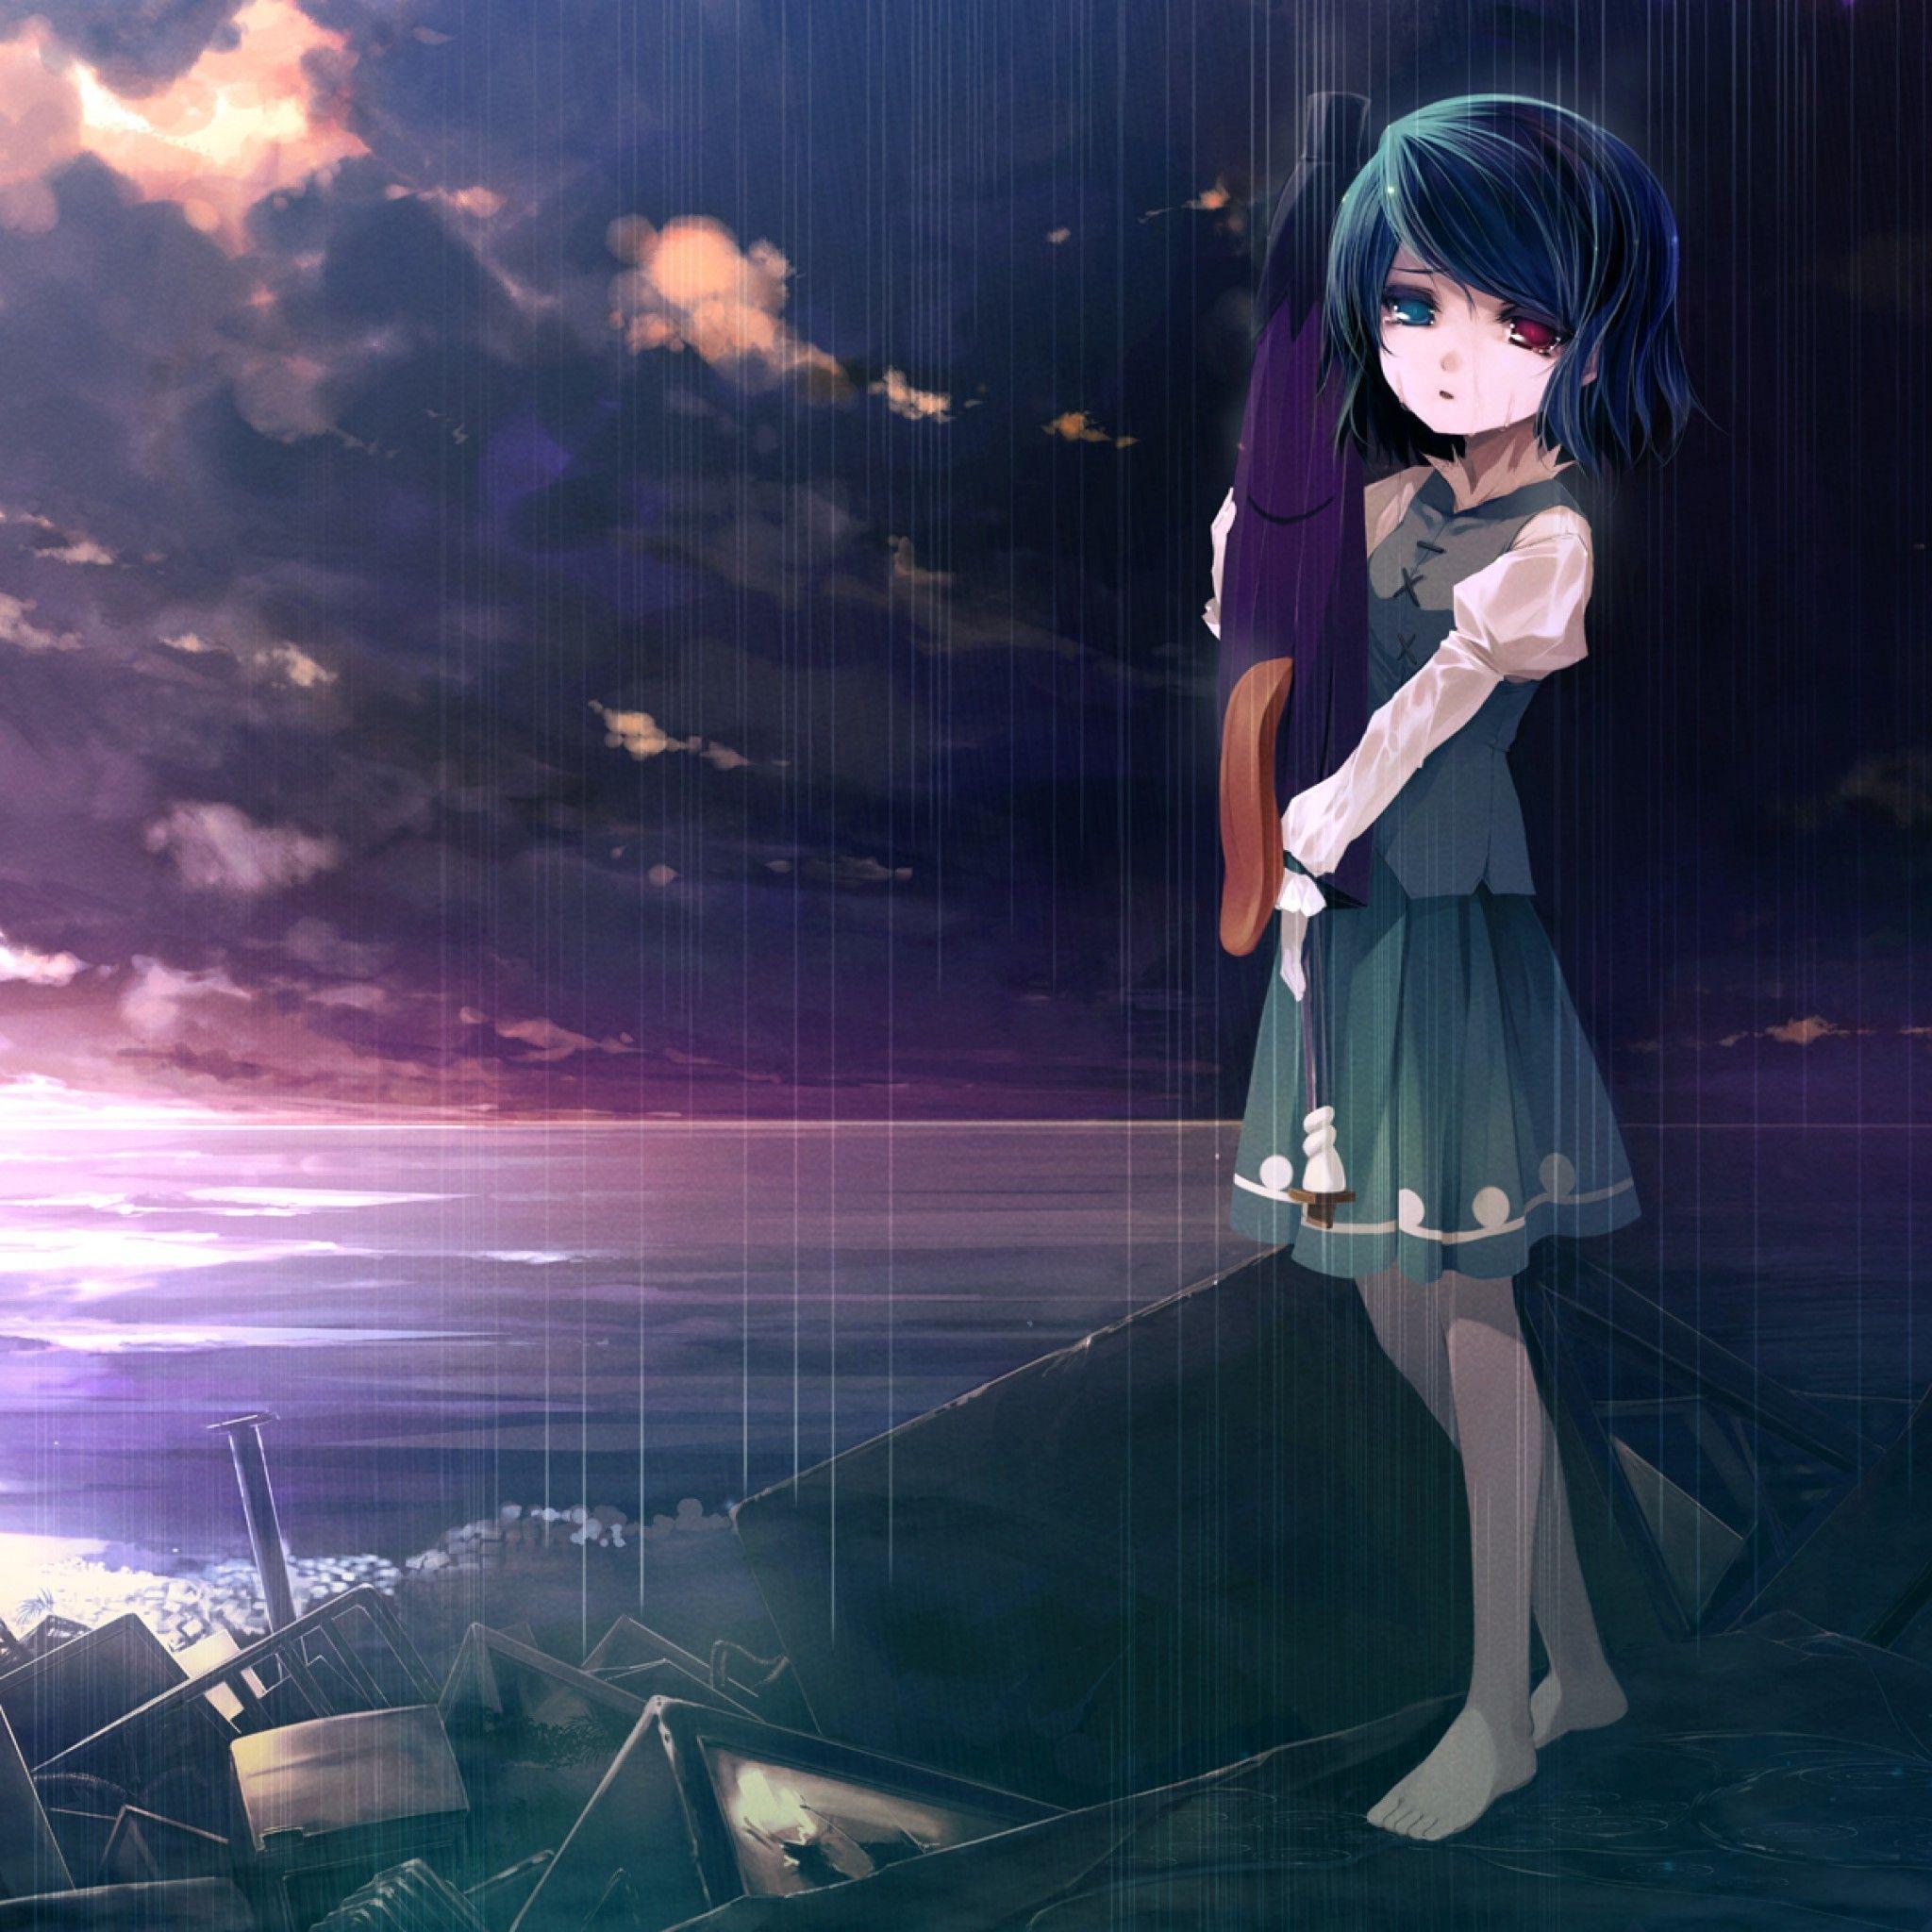 Anime Sad Boy 4k Wallpapers - Wallpaper Cave